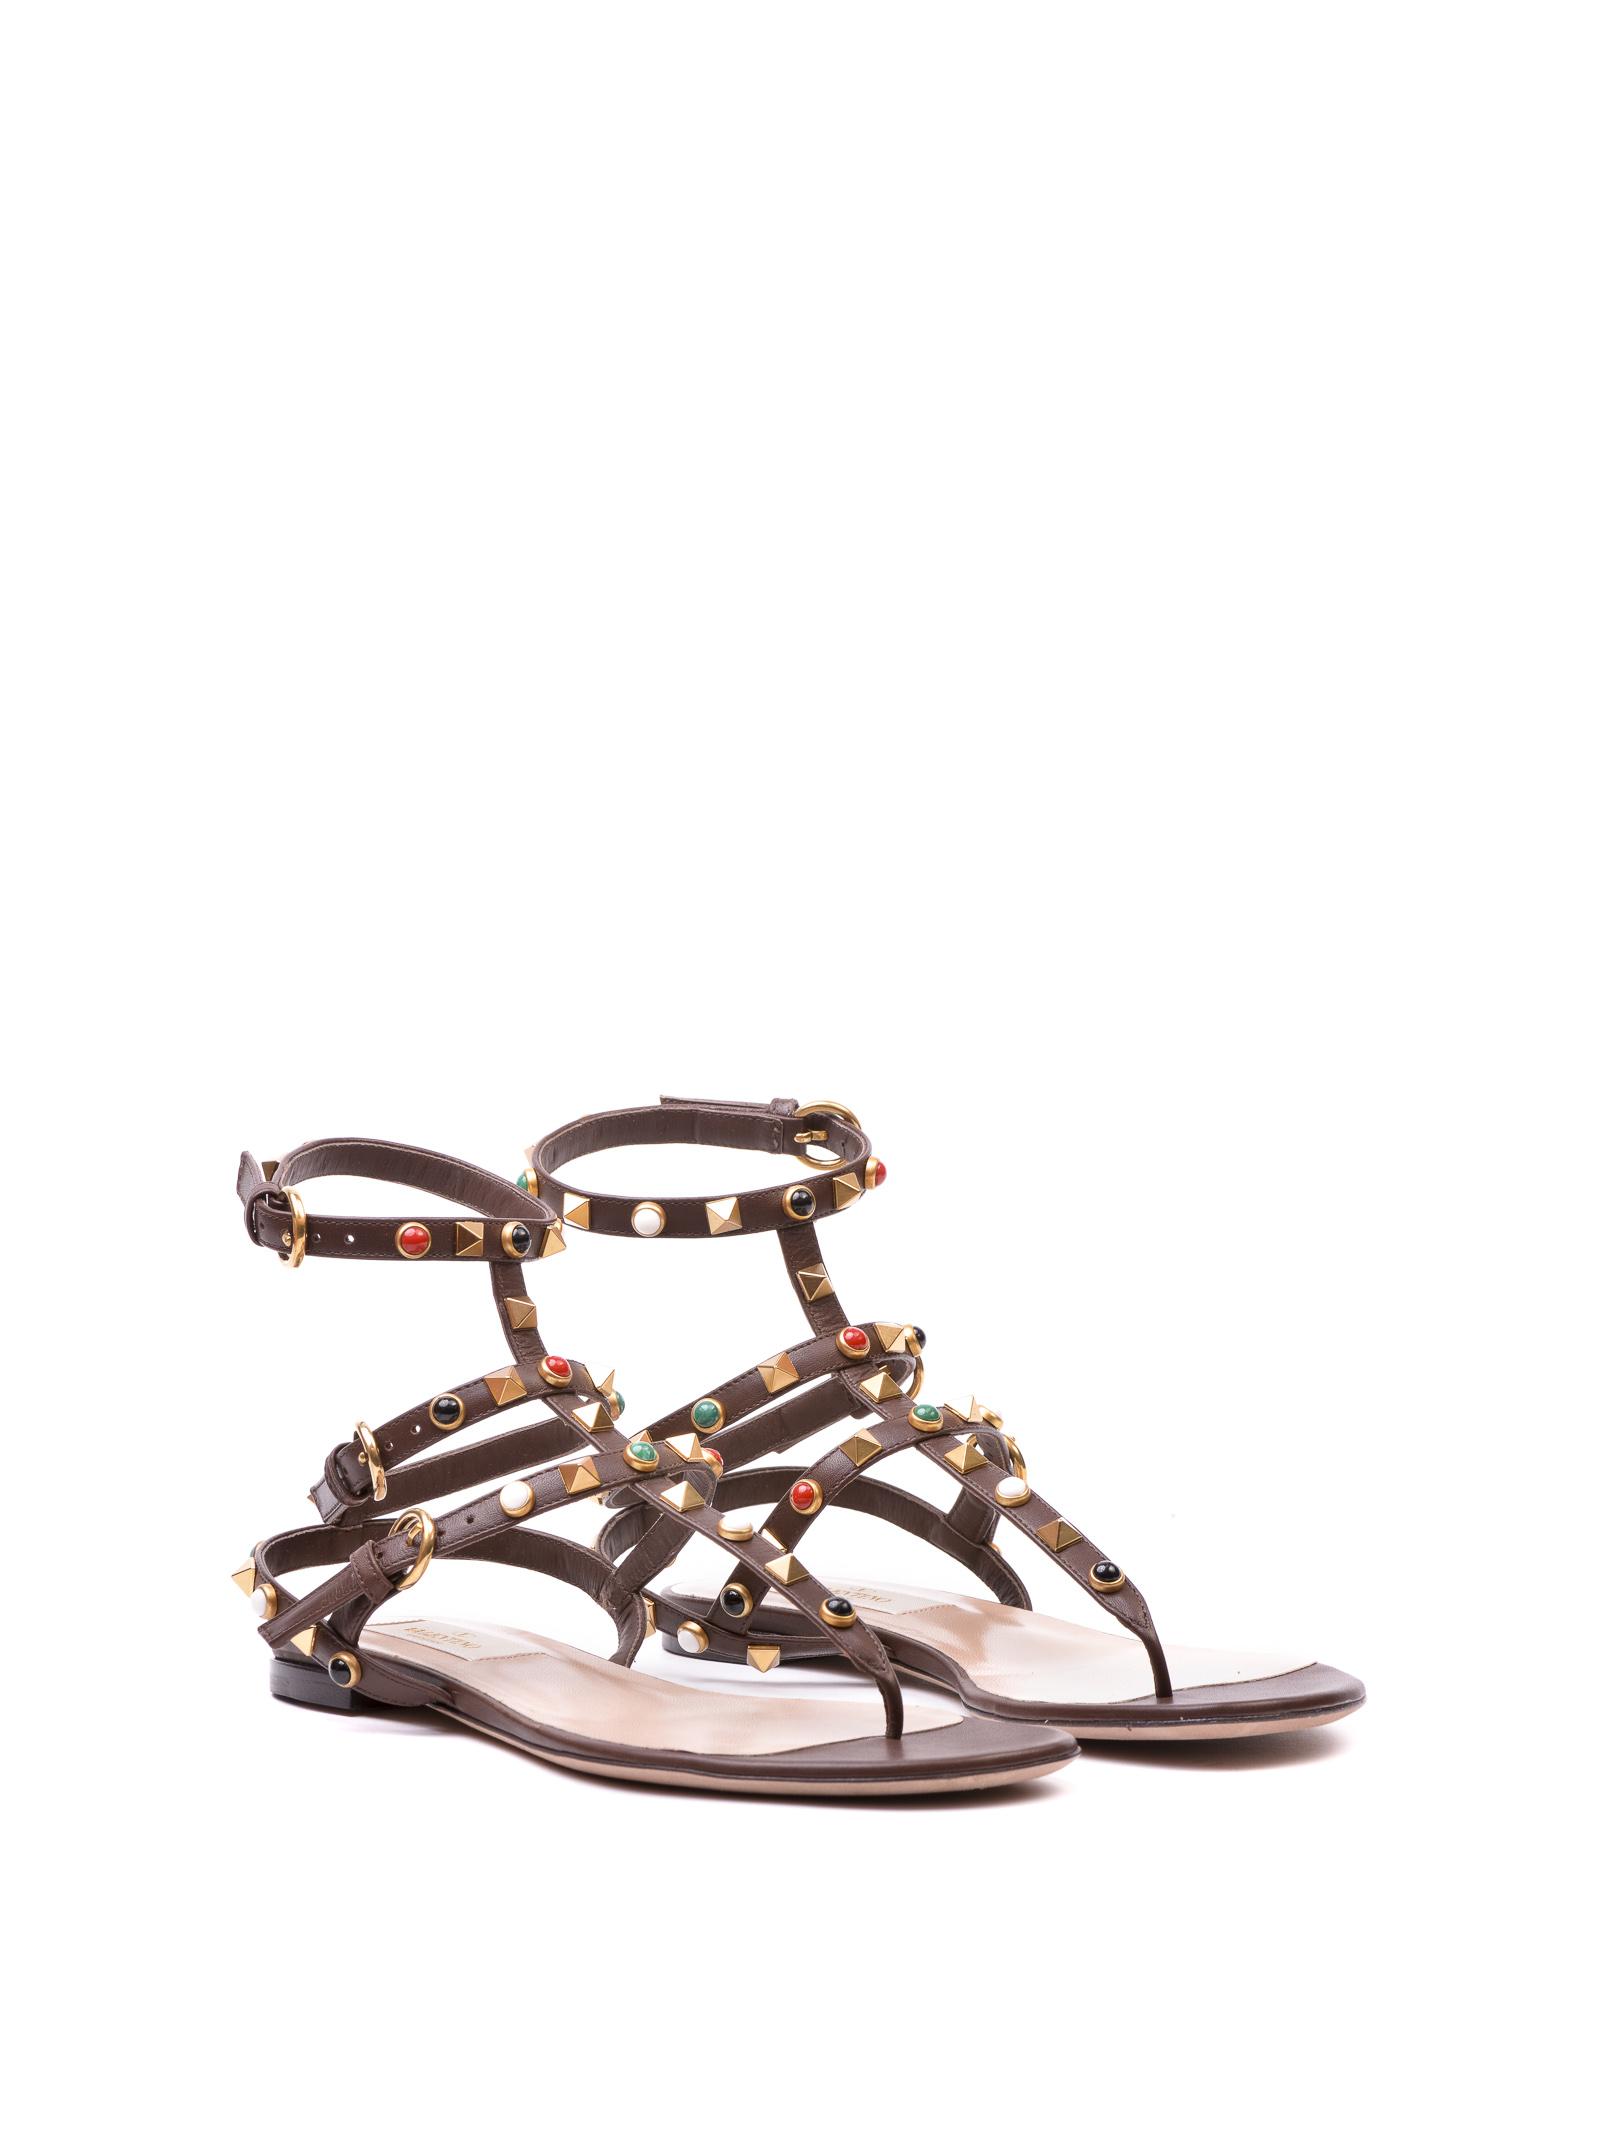 Valentino Garavani Valentino Garavanni Rock Stud Rolling Sandals